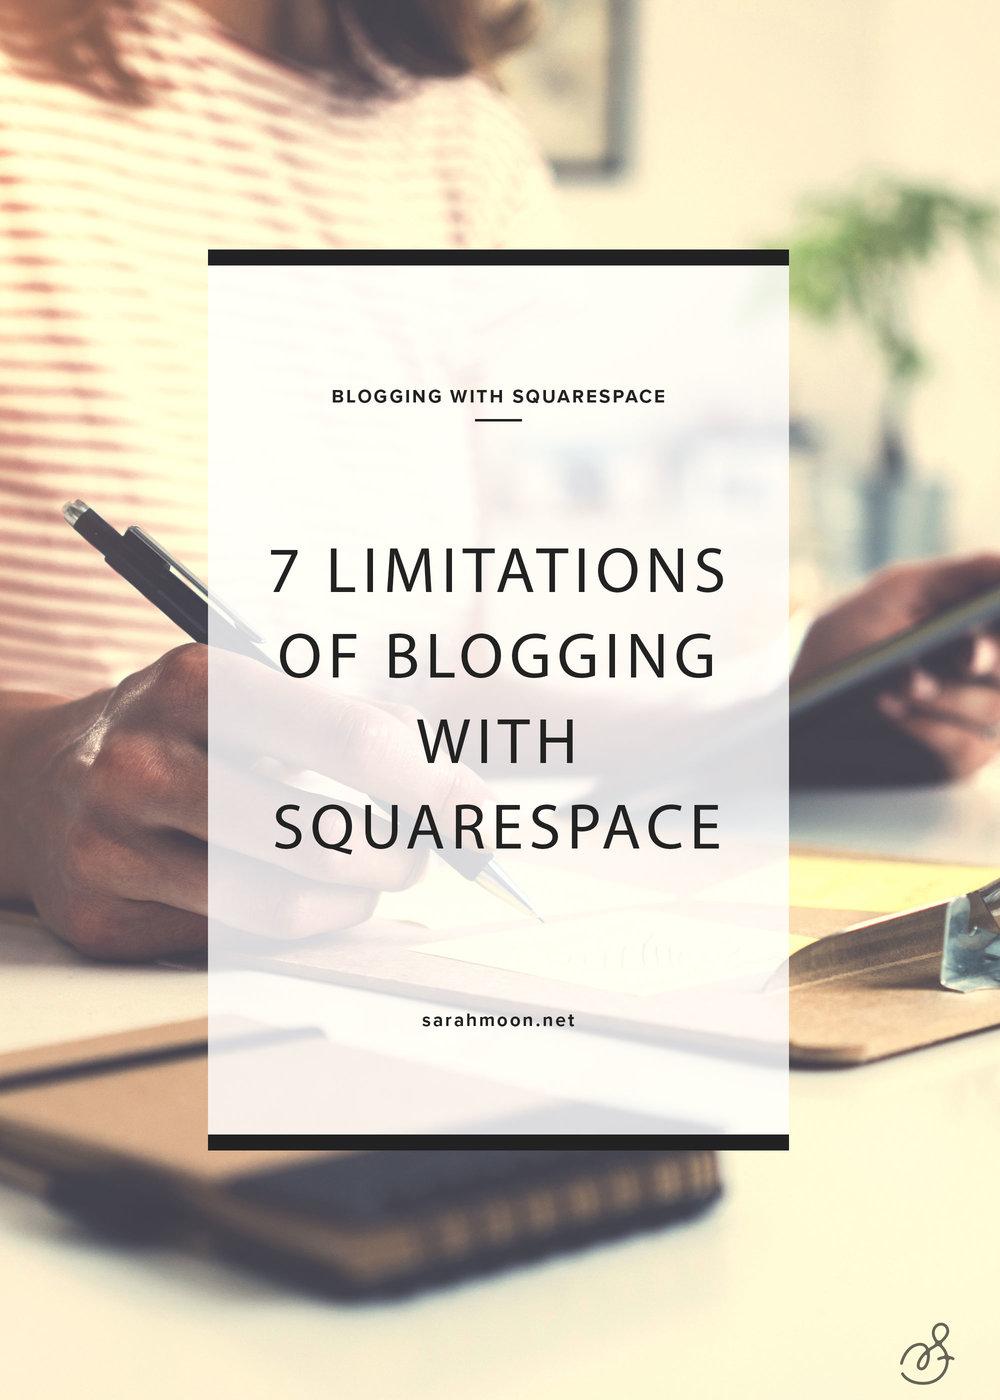 Limitations of Squarespace Blogging - SarahMoon.net